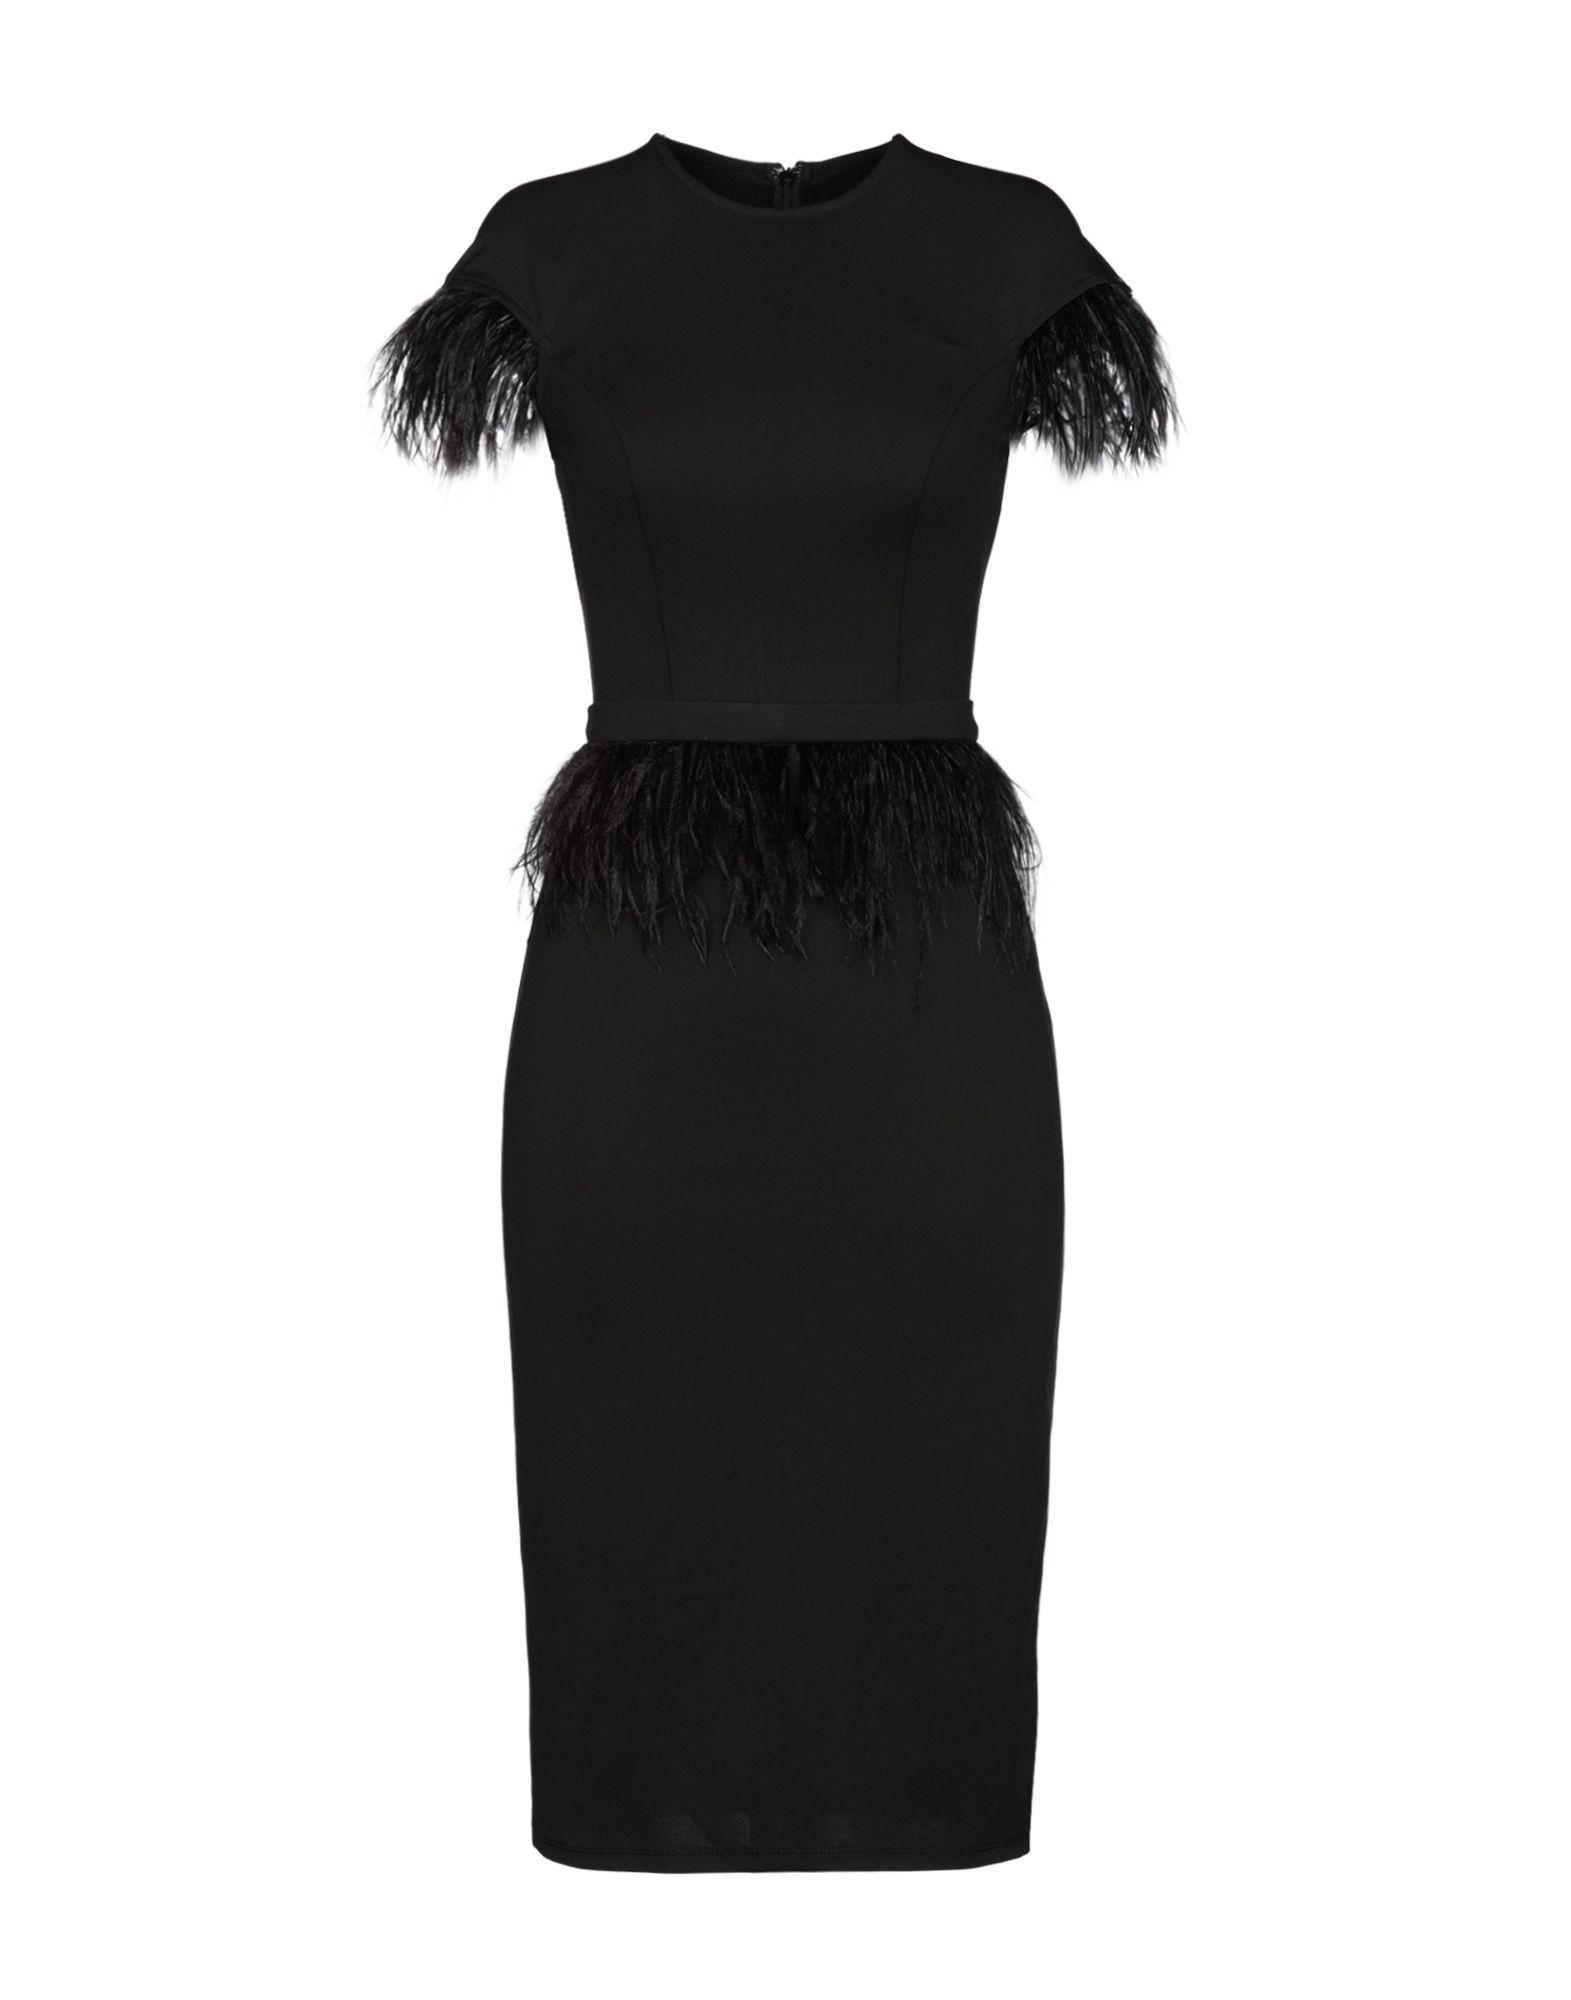 Isabel Garcia Black Pencil Length Dress